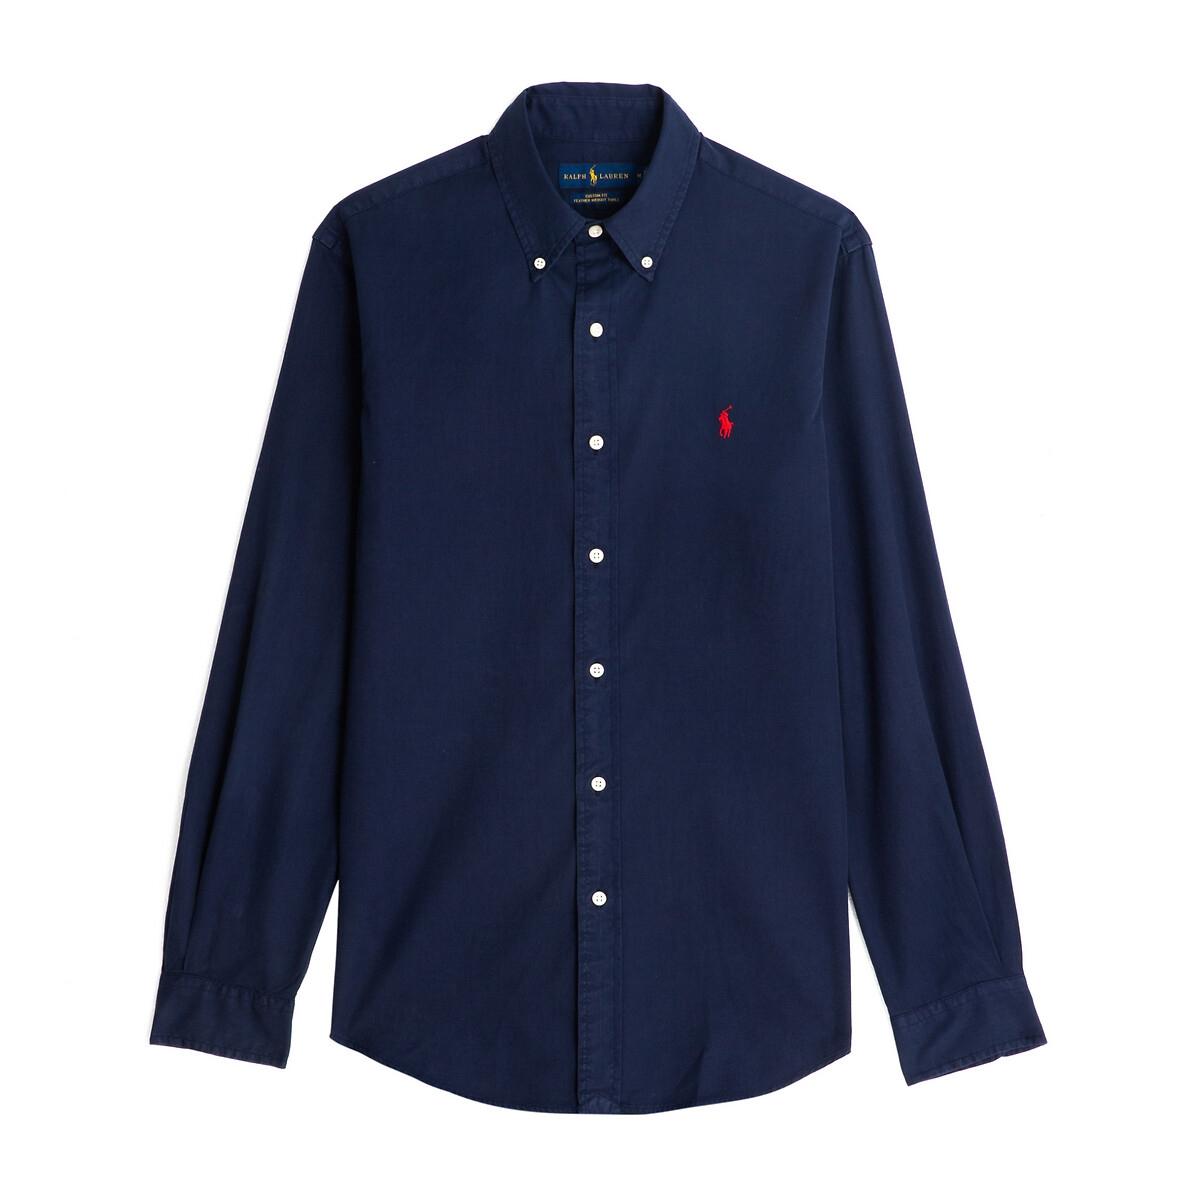 Рубашка La Redoute Прямого покроя из поплина стретч M синий джинсы la redoute стретч узкого покроя hatch 32 34 синий